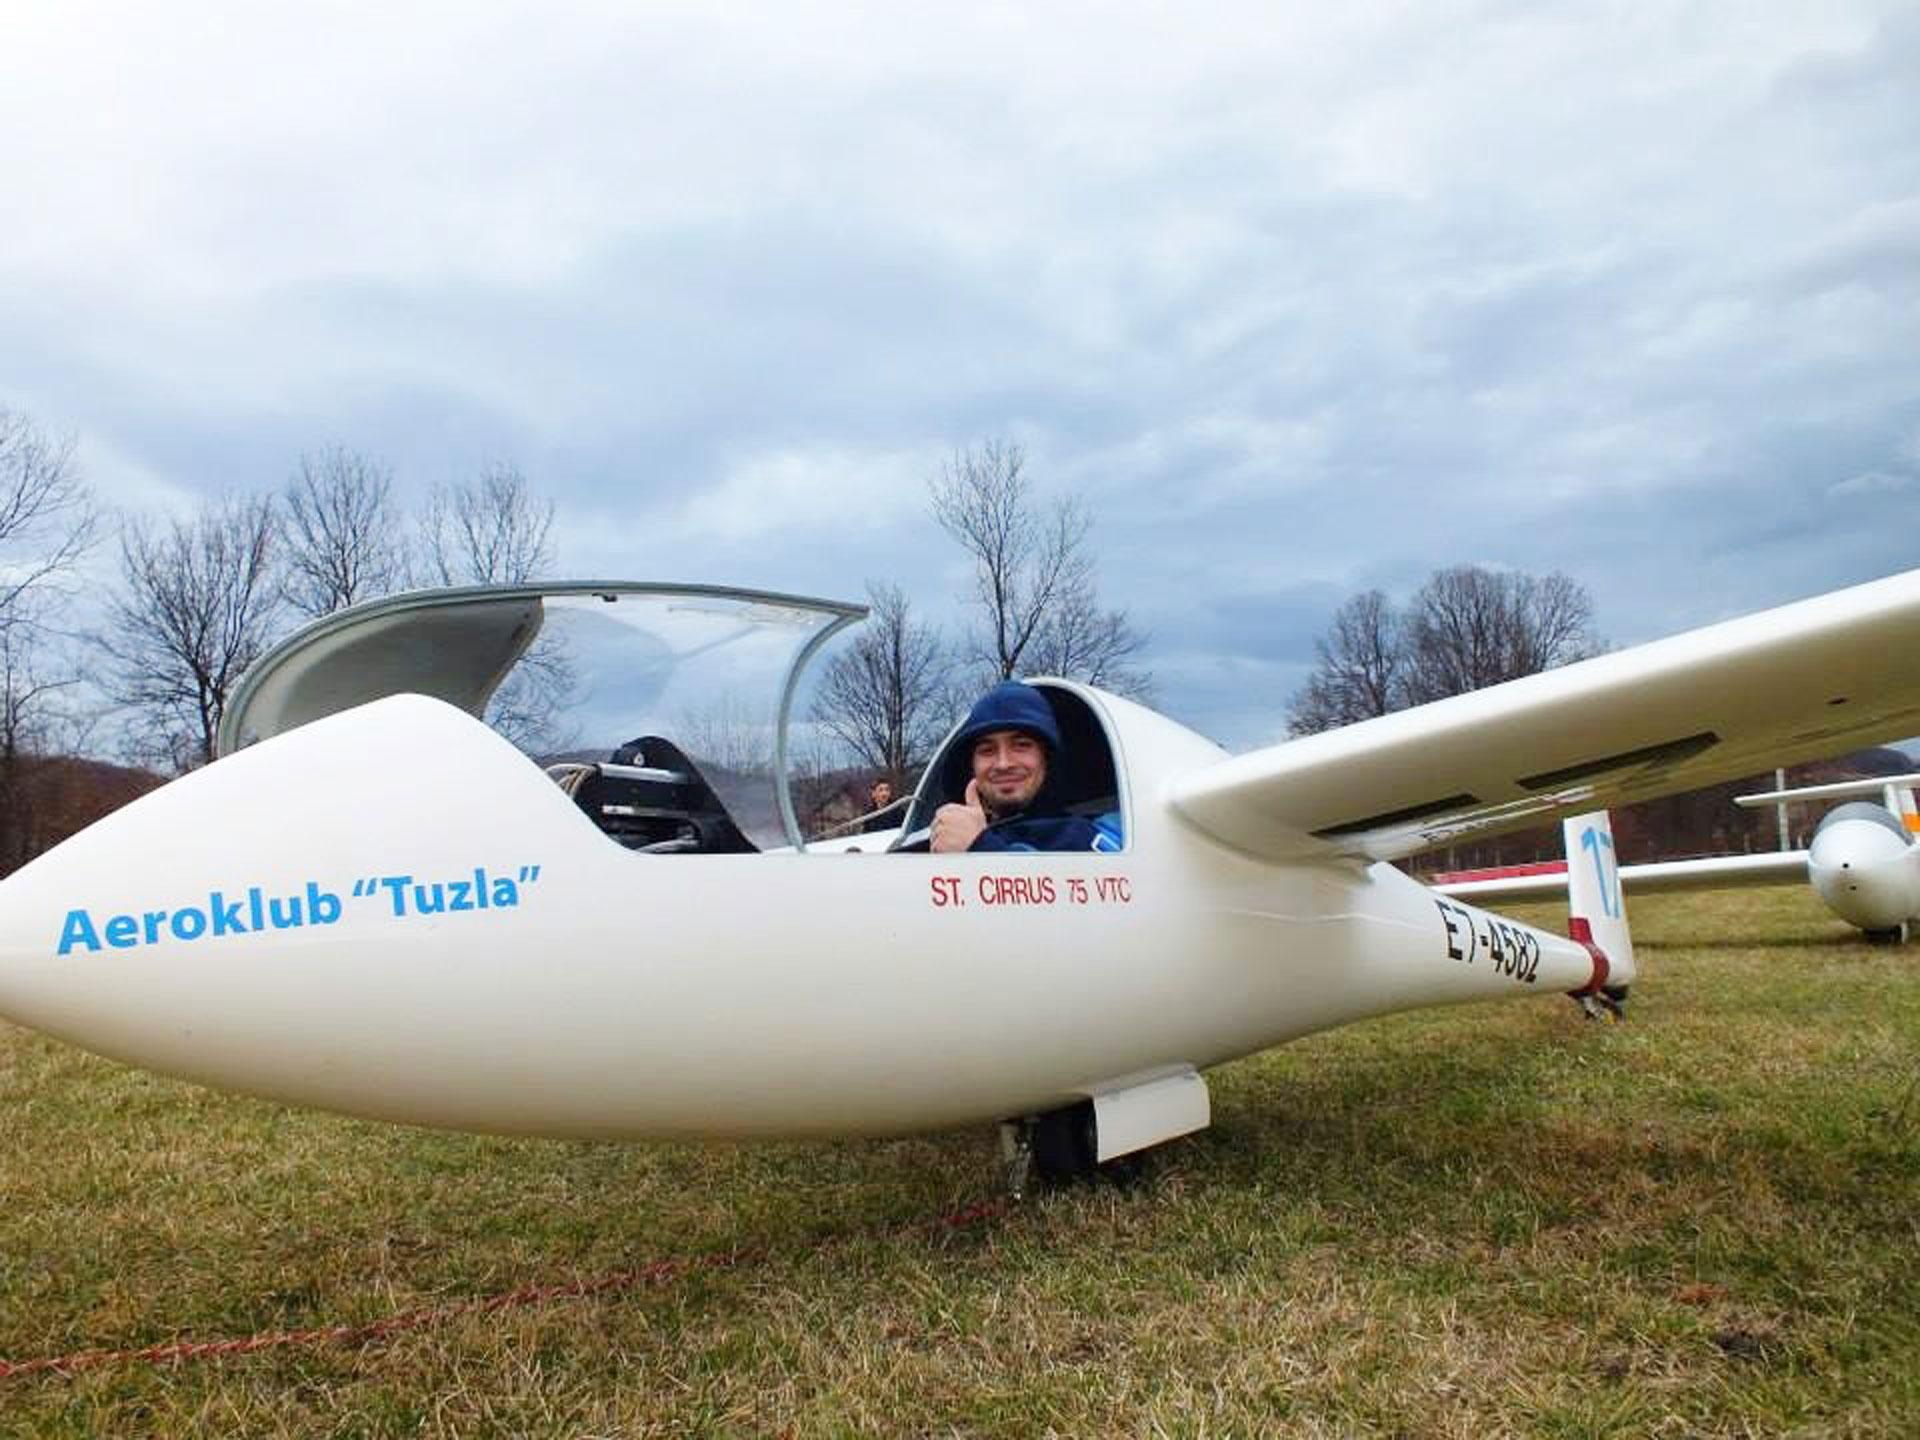 Aero klub Tuzla